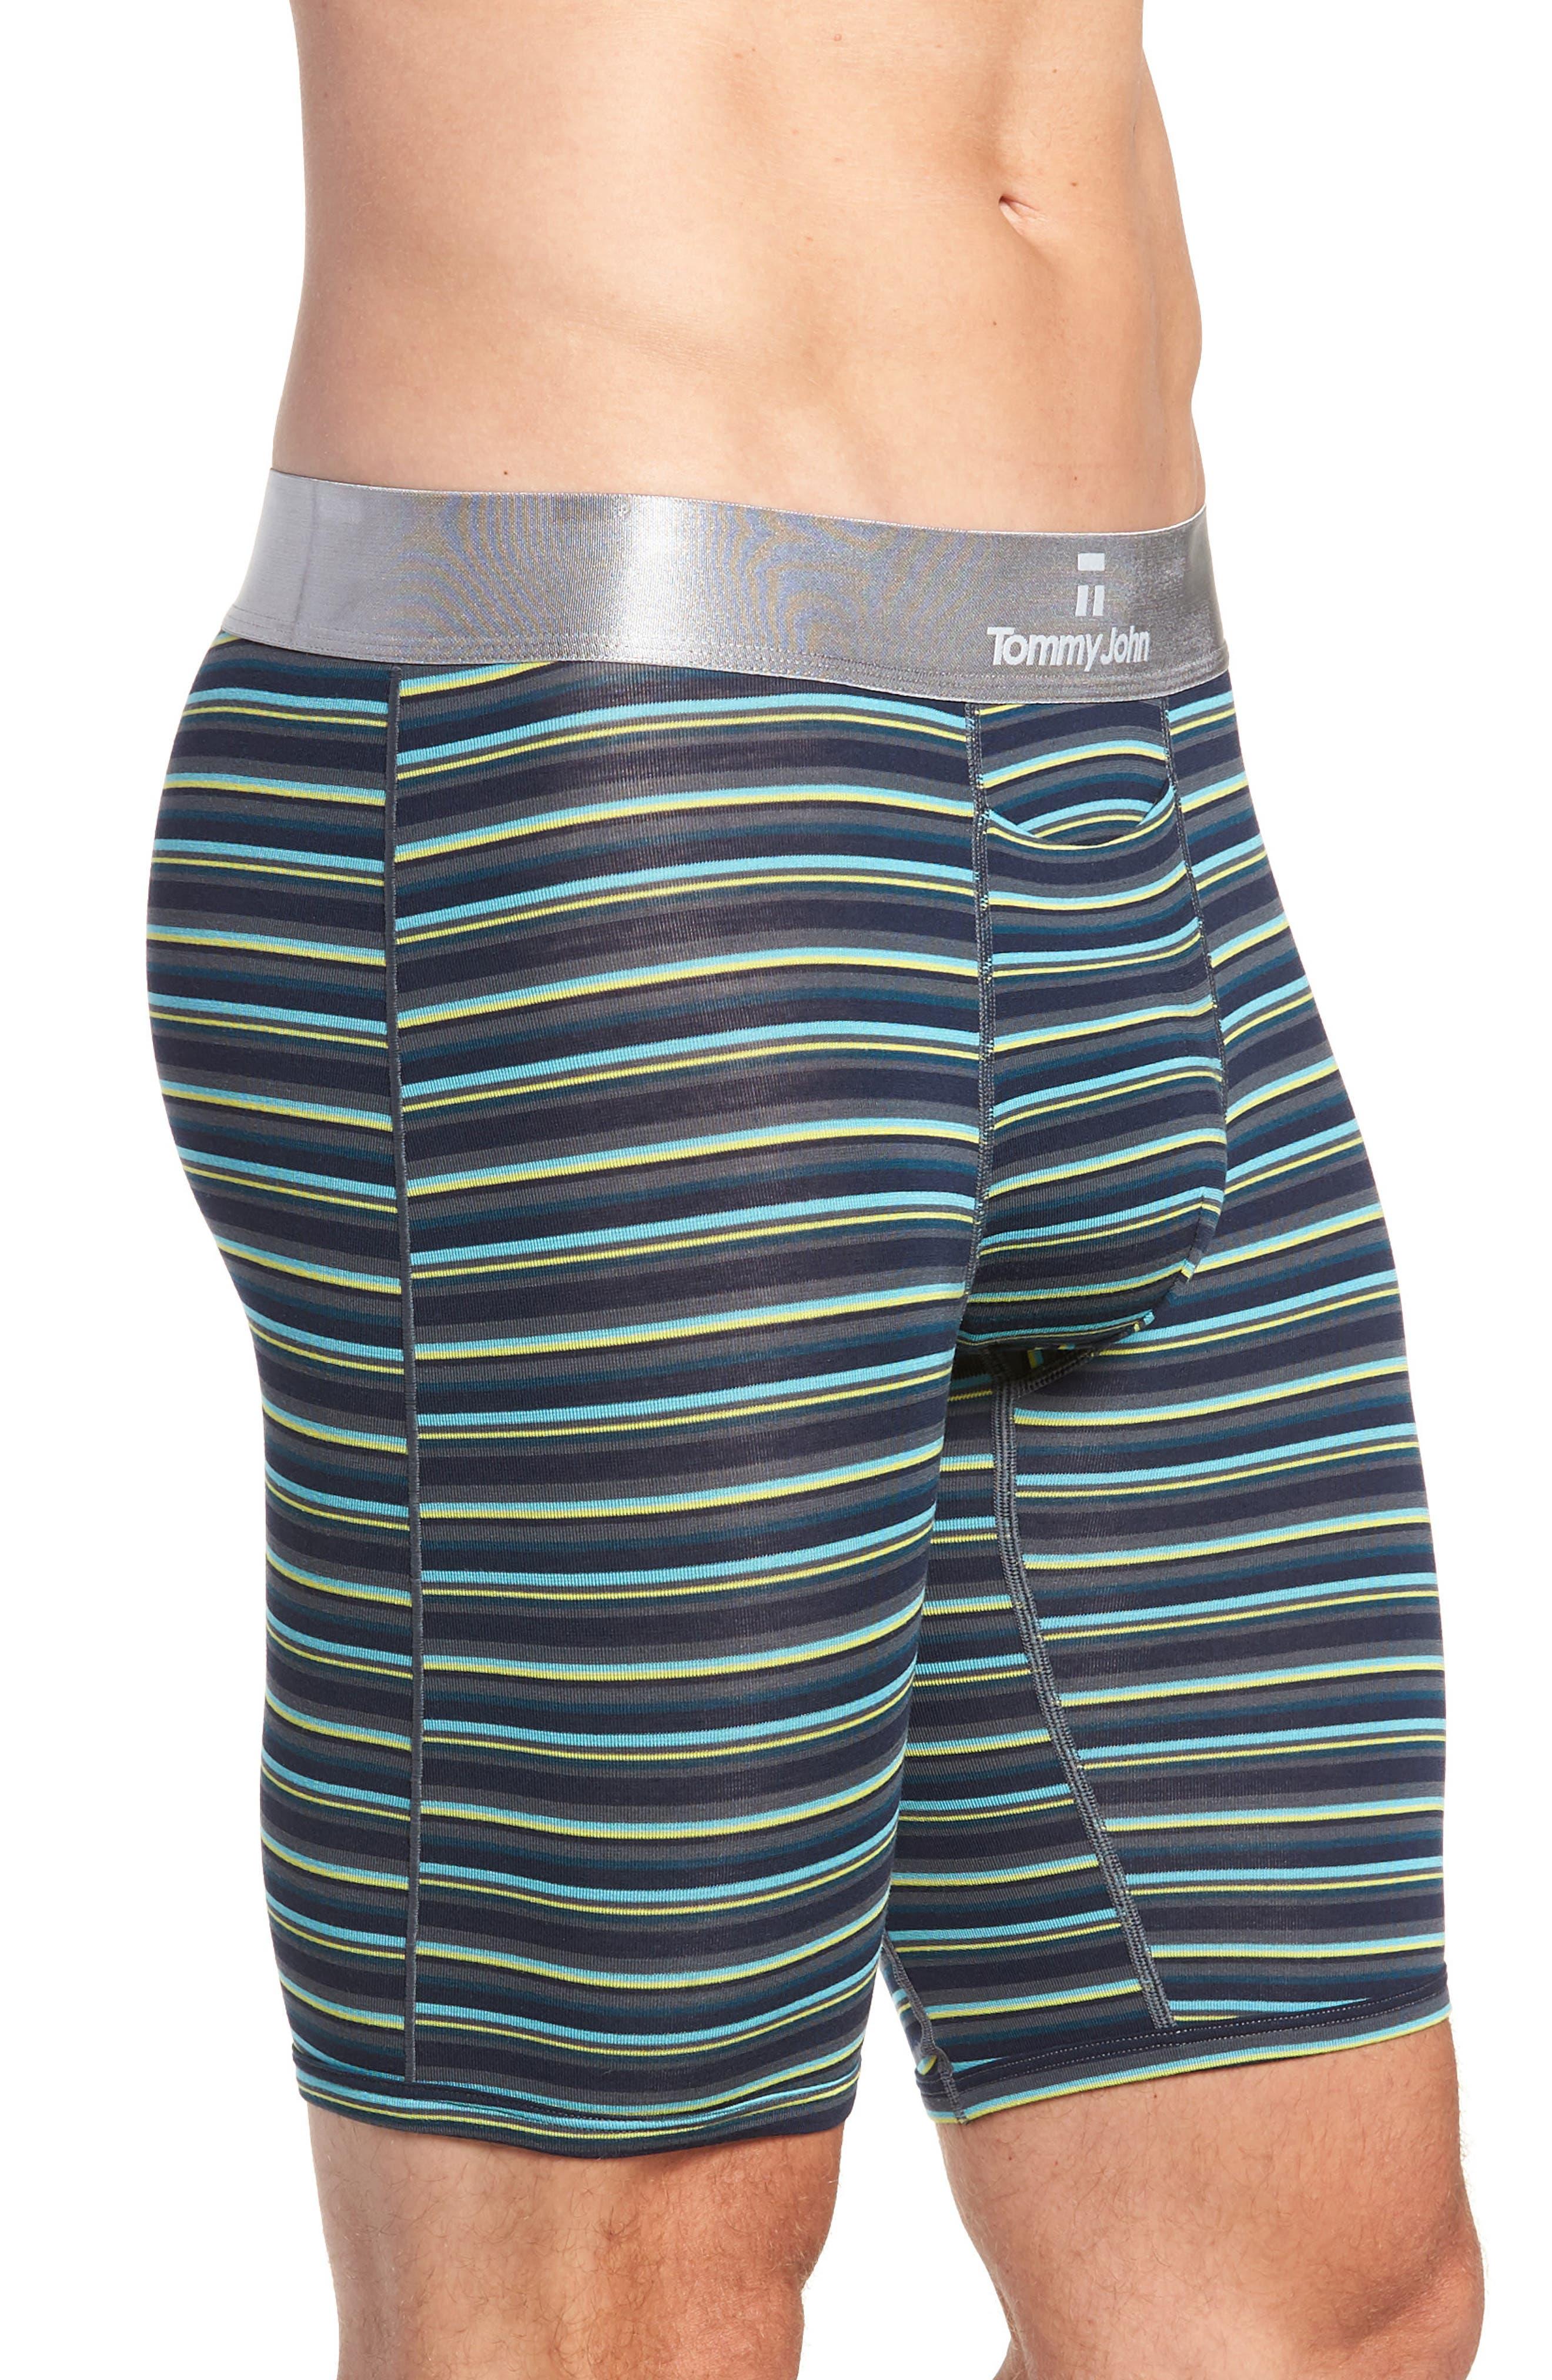 Second Skin Boxer Briefs,                             Alternate thumbnail 3, color,                             DRESS BLUES/ TURBULENCE